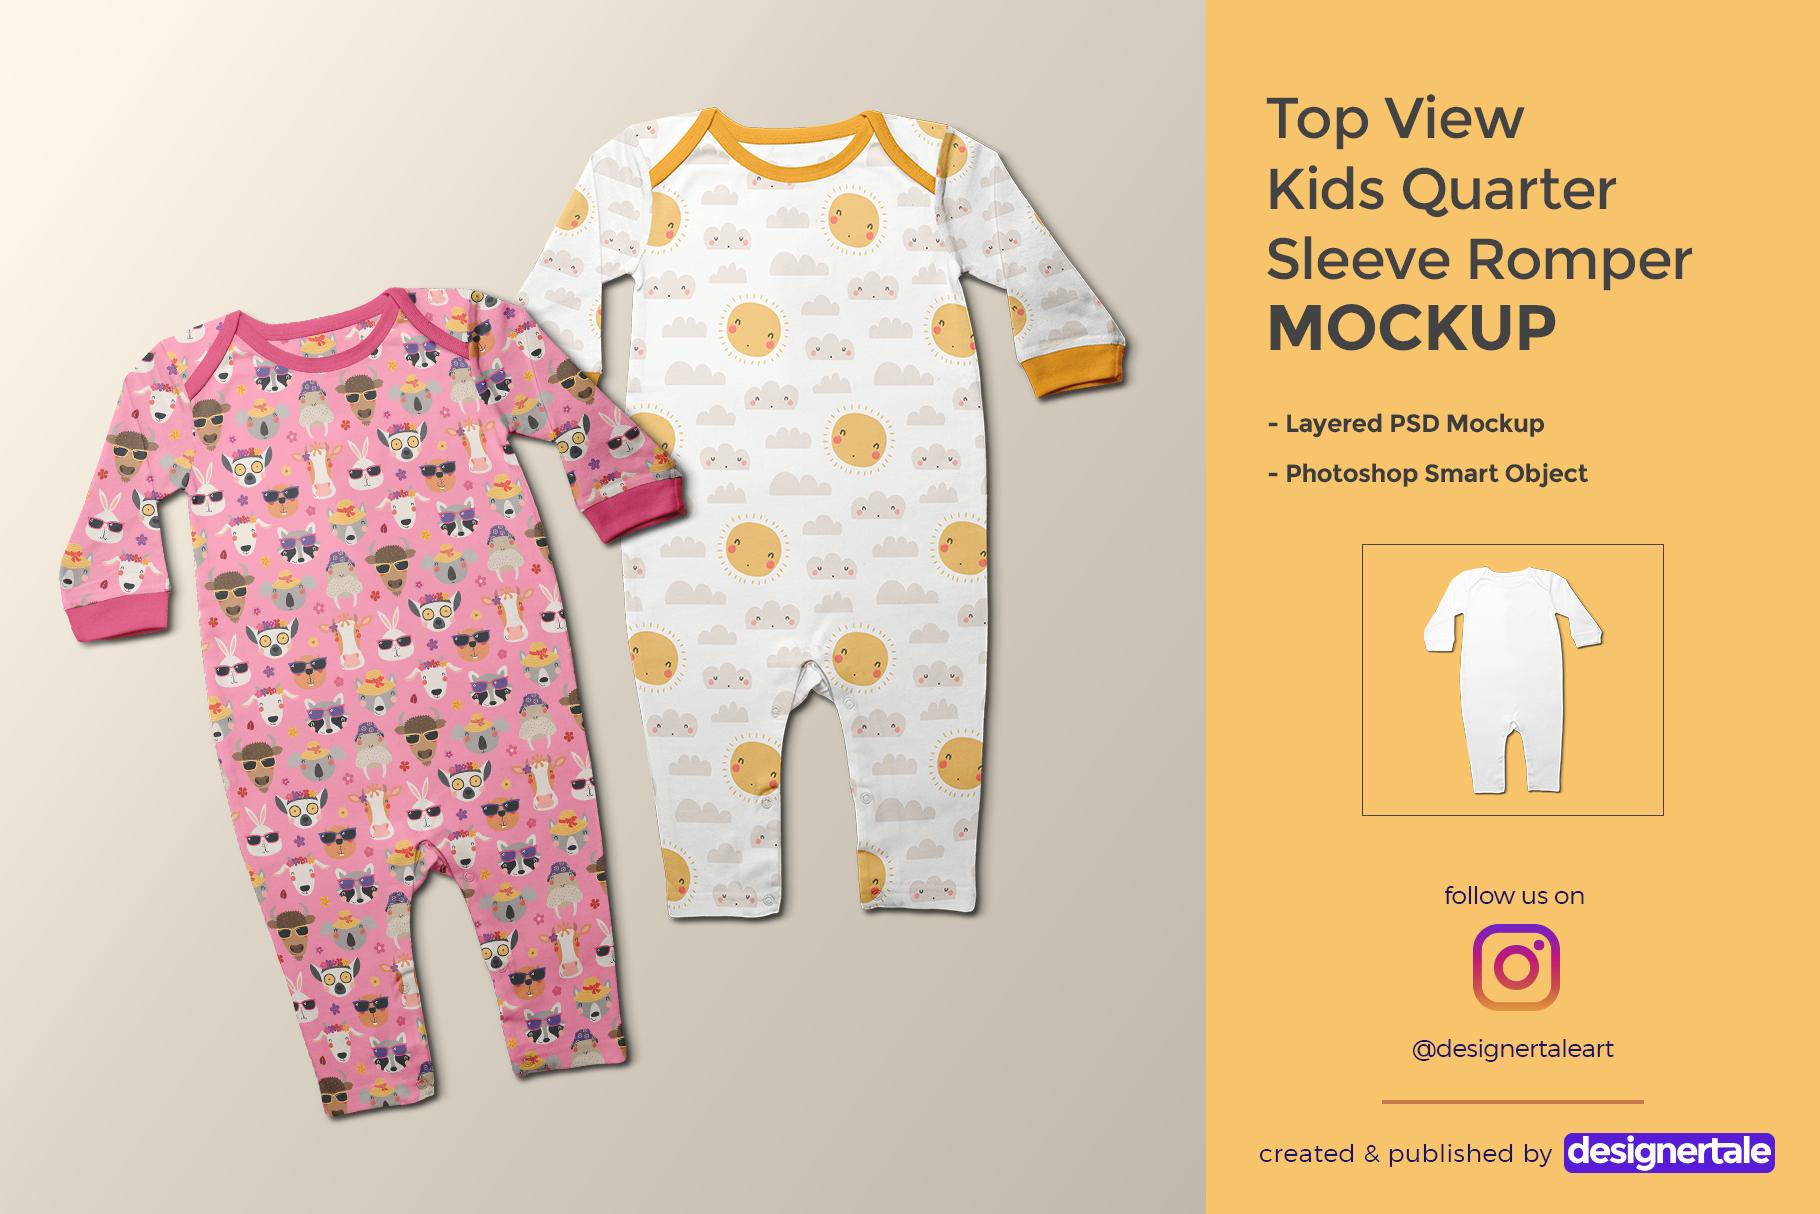 top view kids quarter sleeve romper mockup